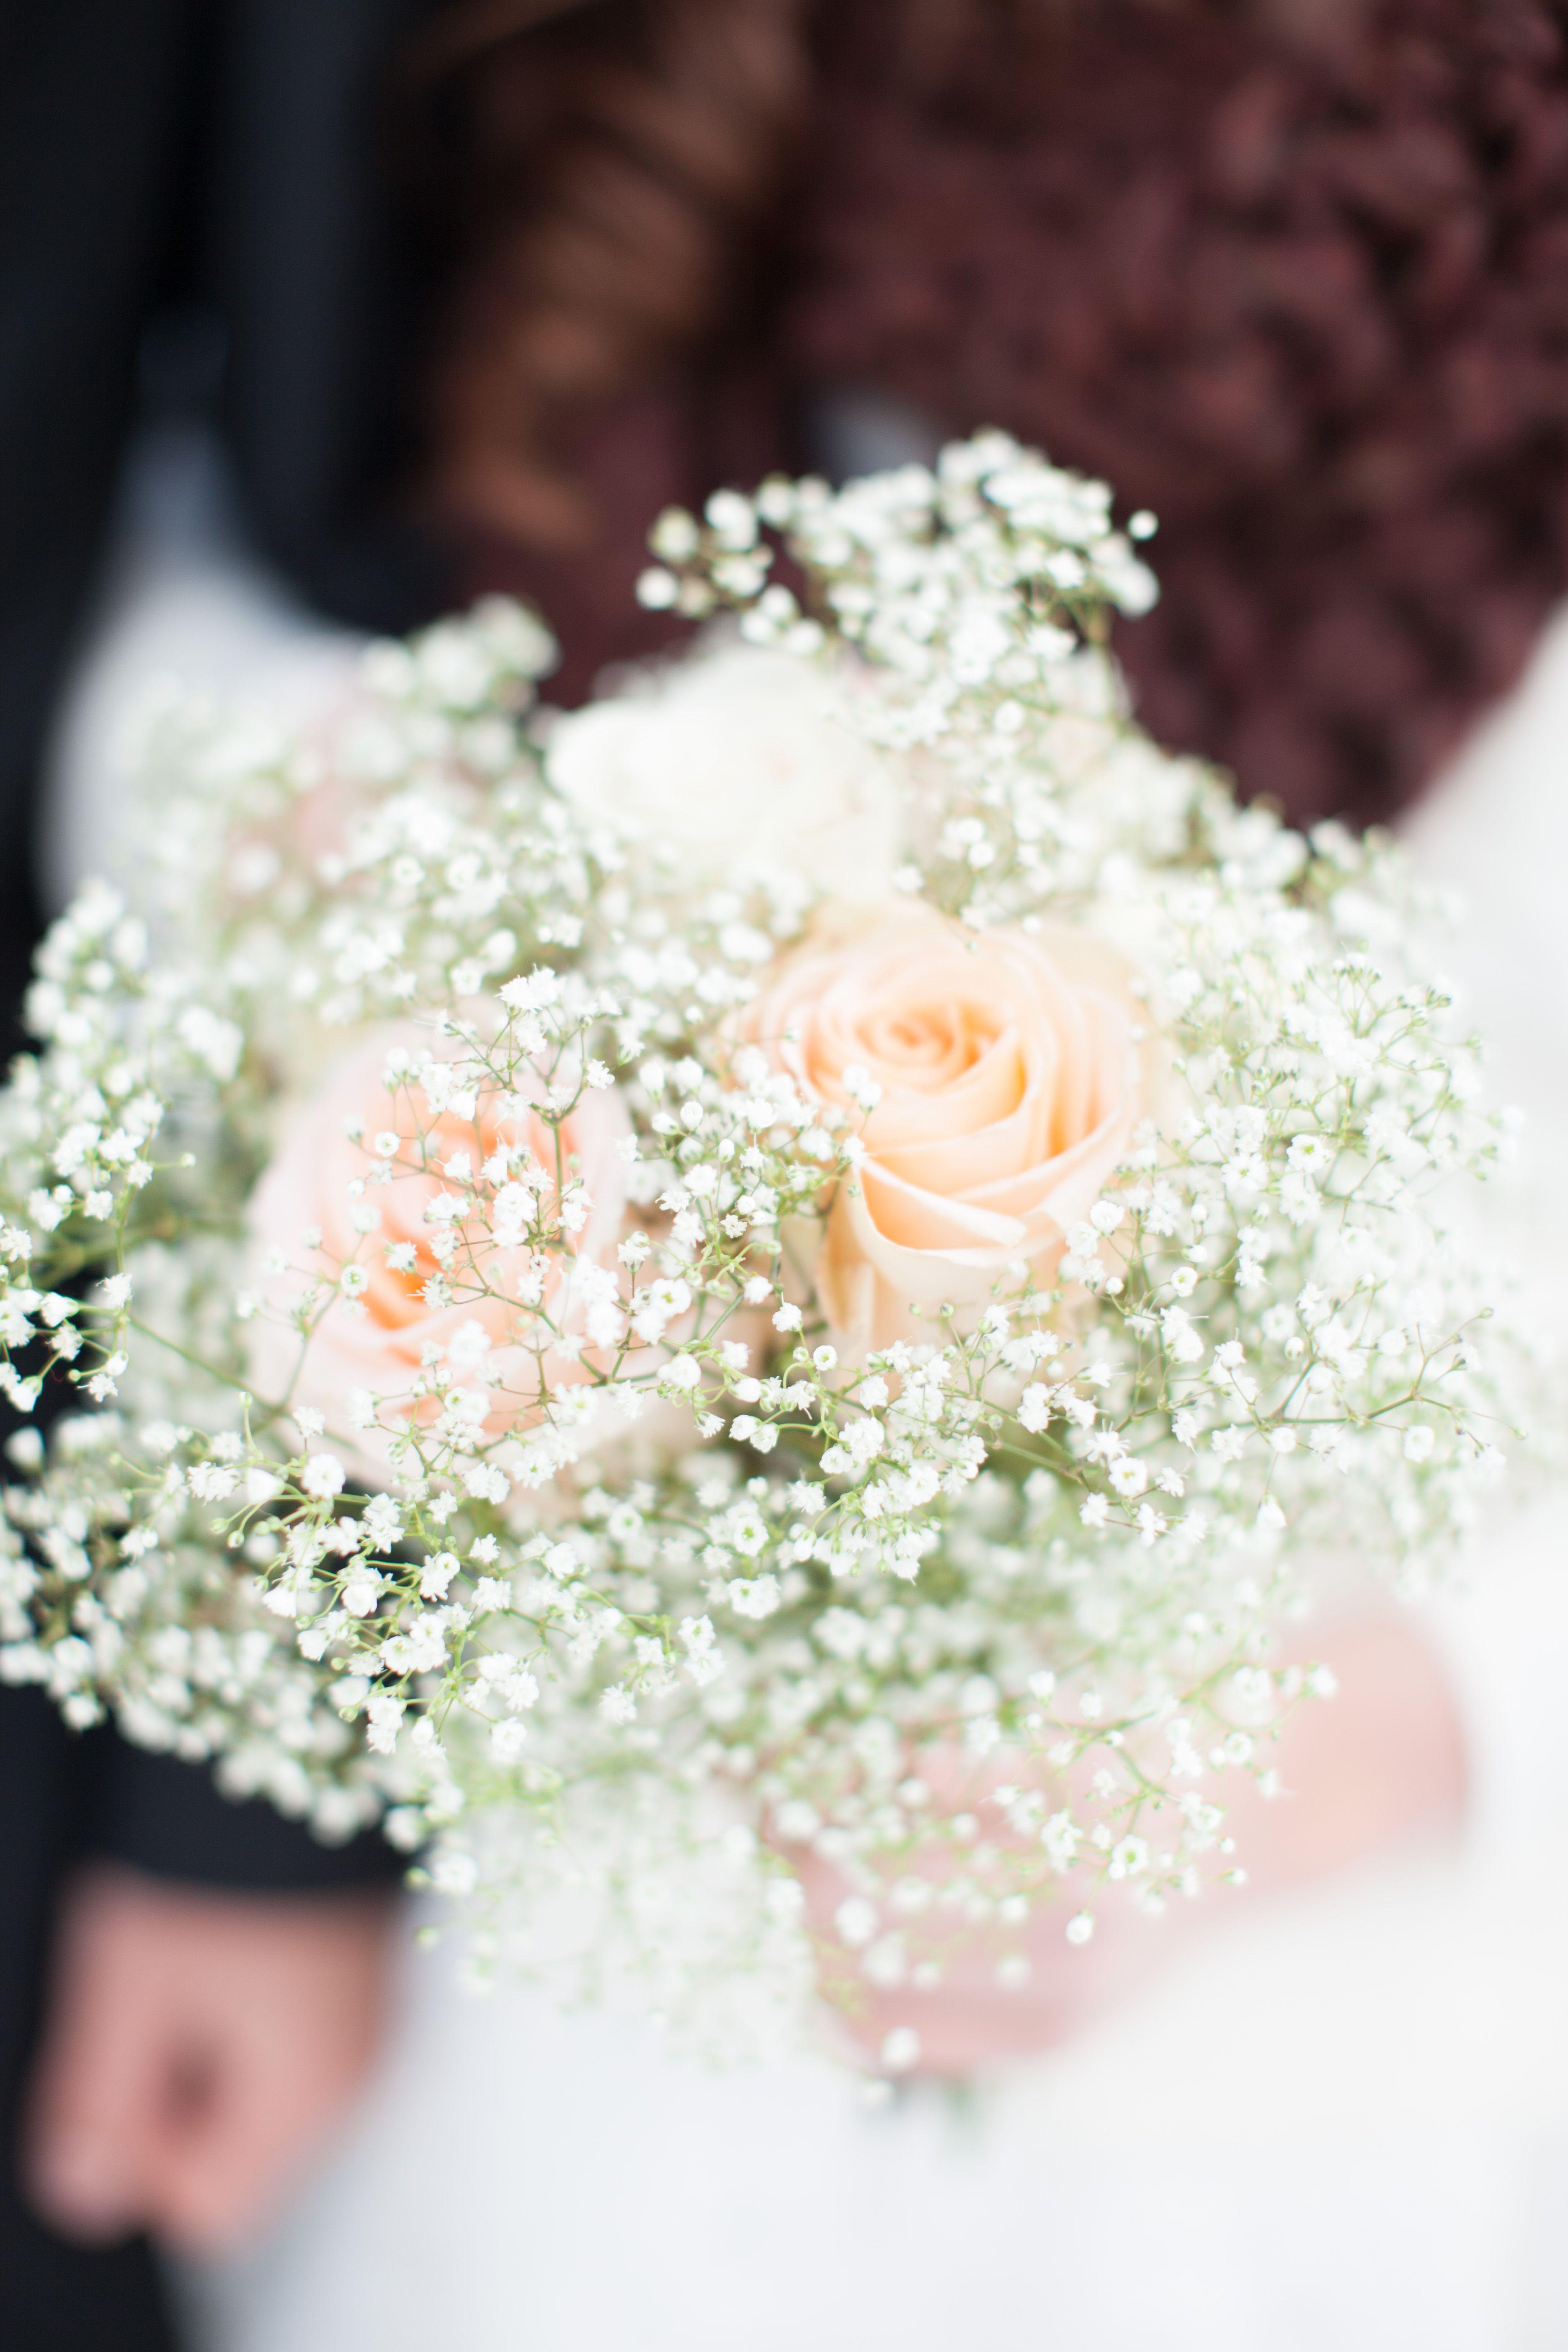 Bridesmaids bouquet babys breath roses winter white wedding bridesmaids bouquet babys breath roses winter white wedding mightylinksfo